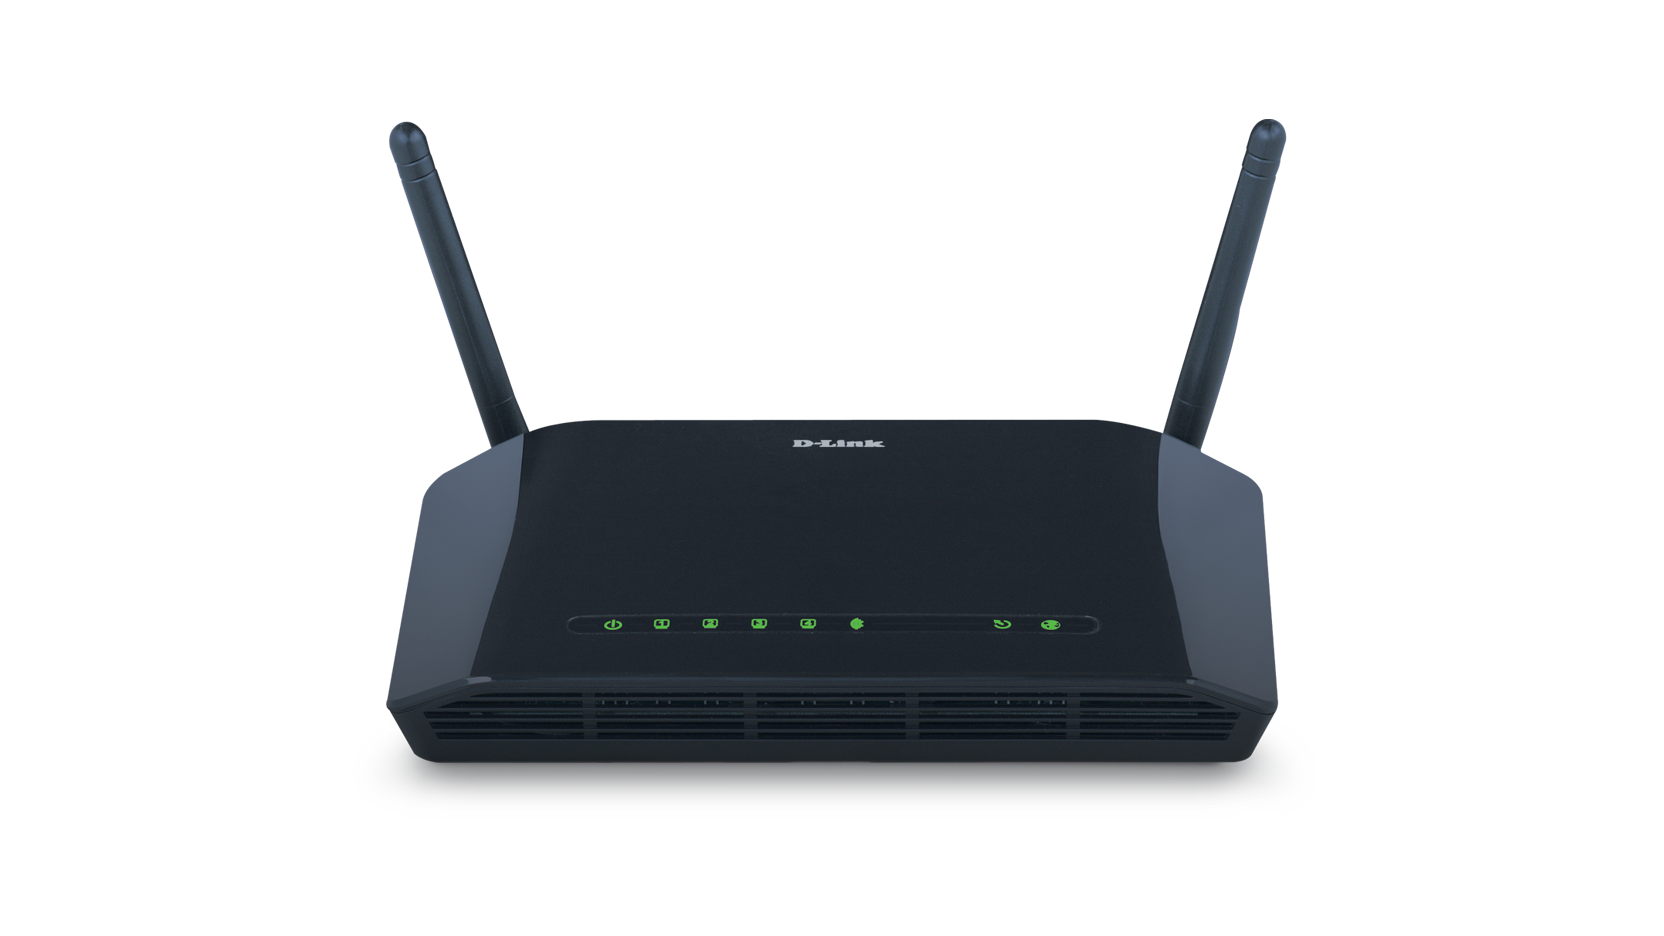 CenturyLink Calix 844G Wireless 2.4 GHZ 5G Dual WIFI Internet Modem GigaCenter